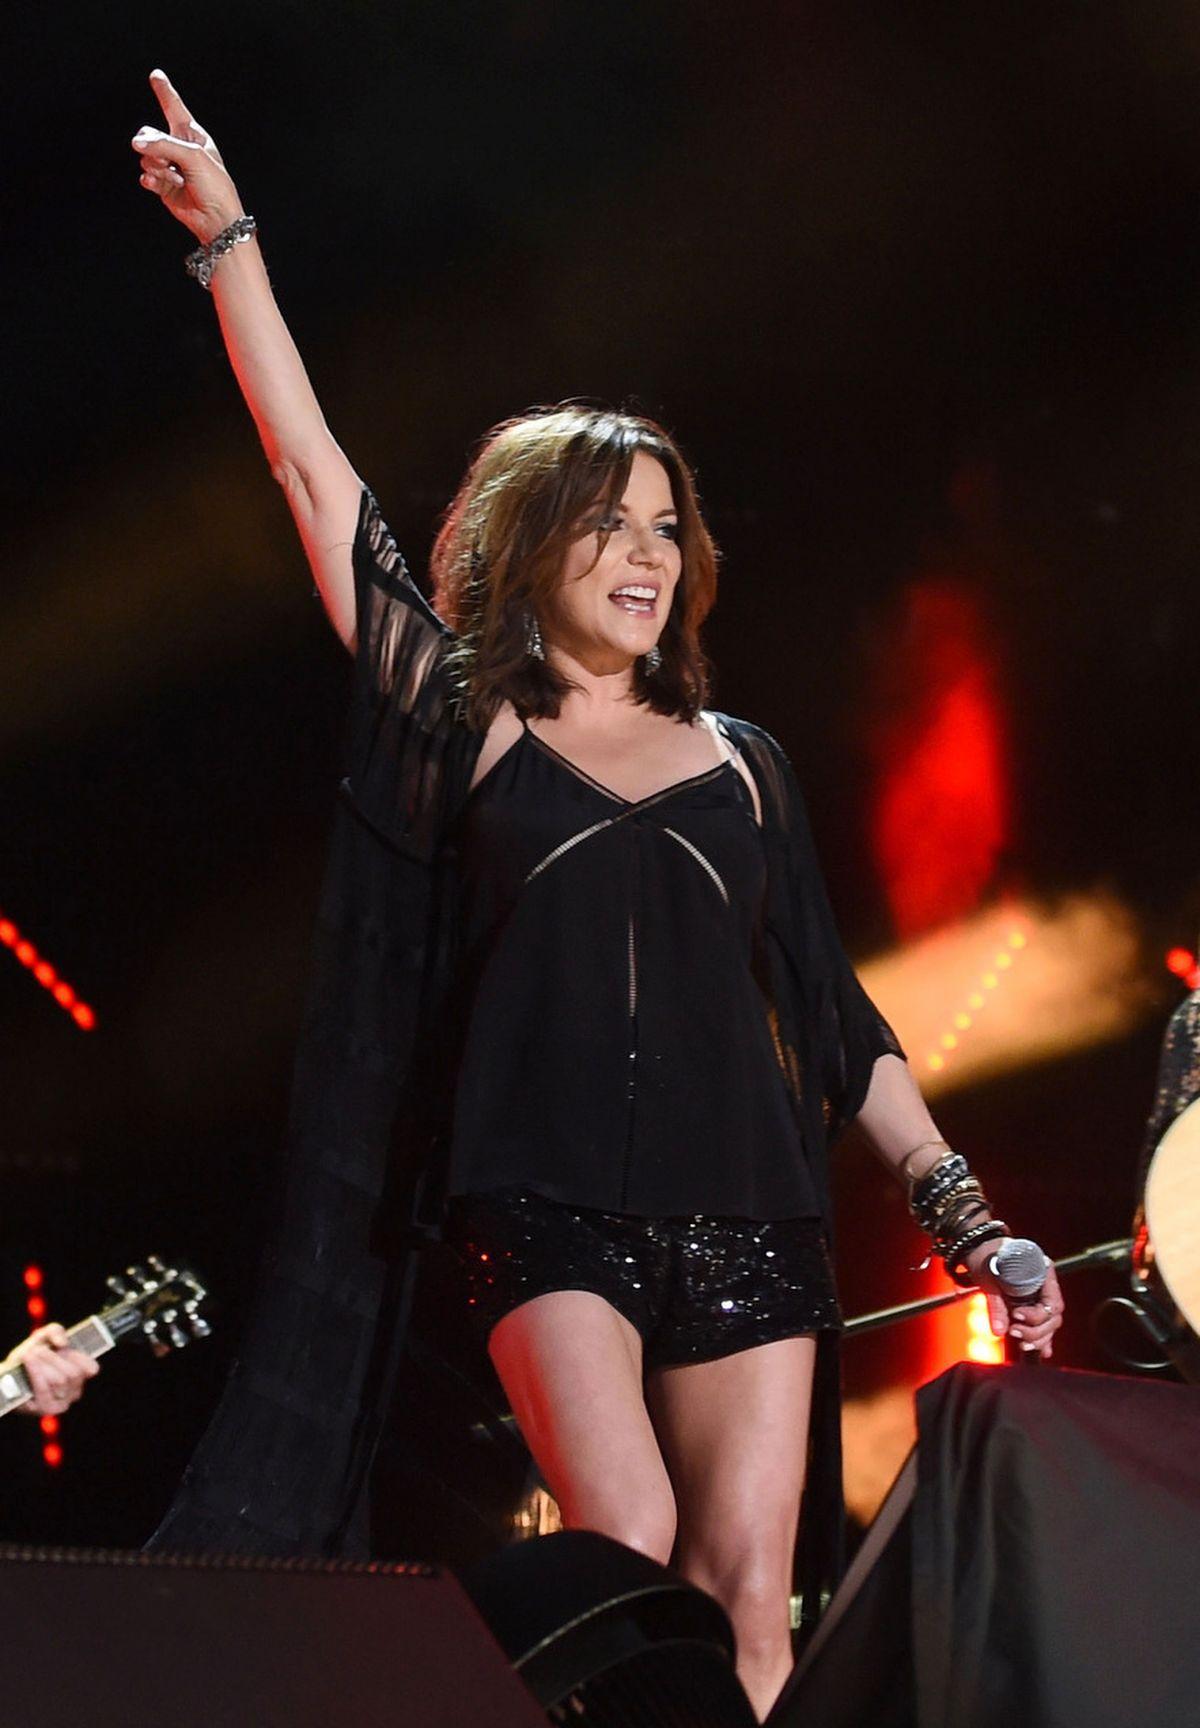 MARTINA MCBRIDE Performs at 2016 CMA Music Festival in Nashville 06/11/2016